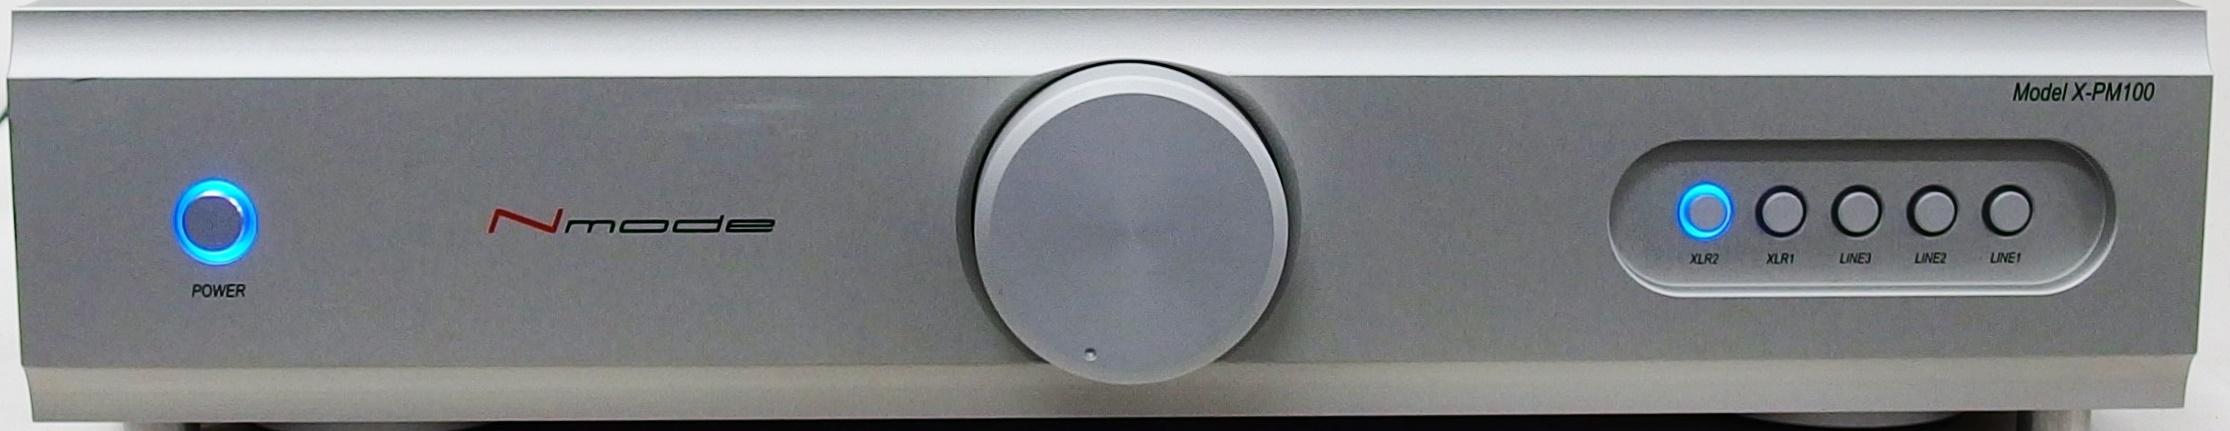 X-PM100プロト